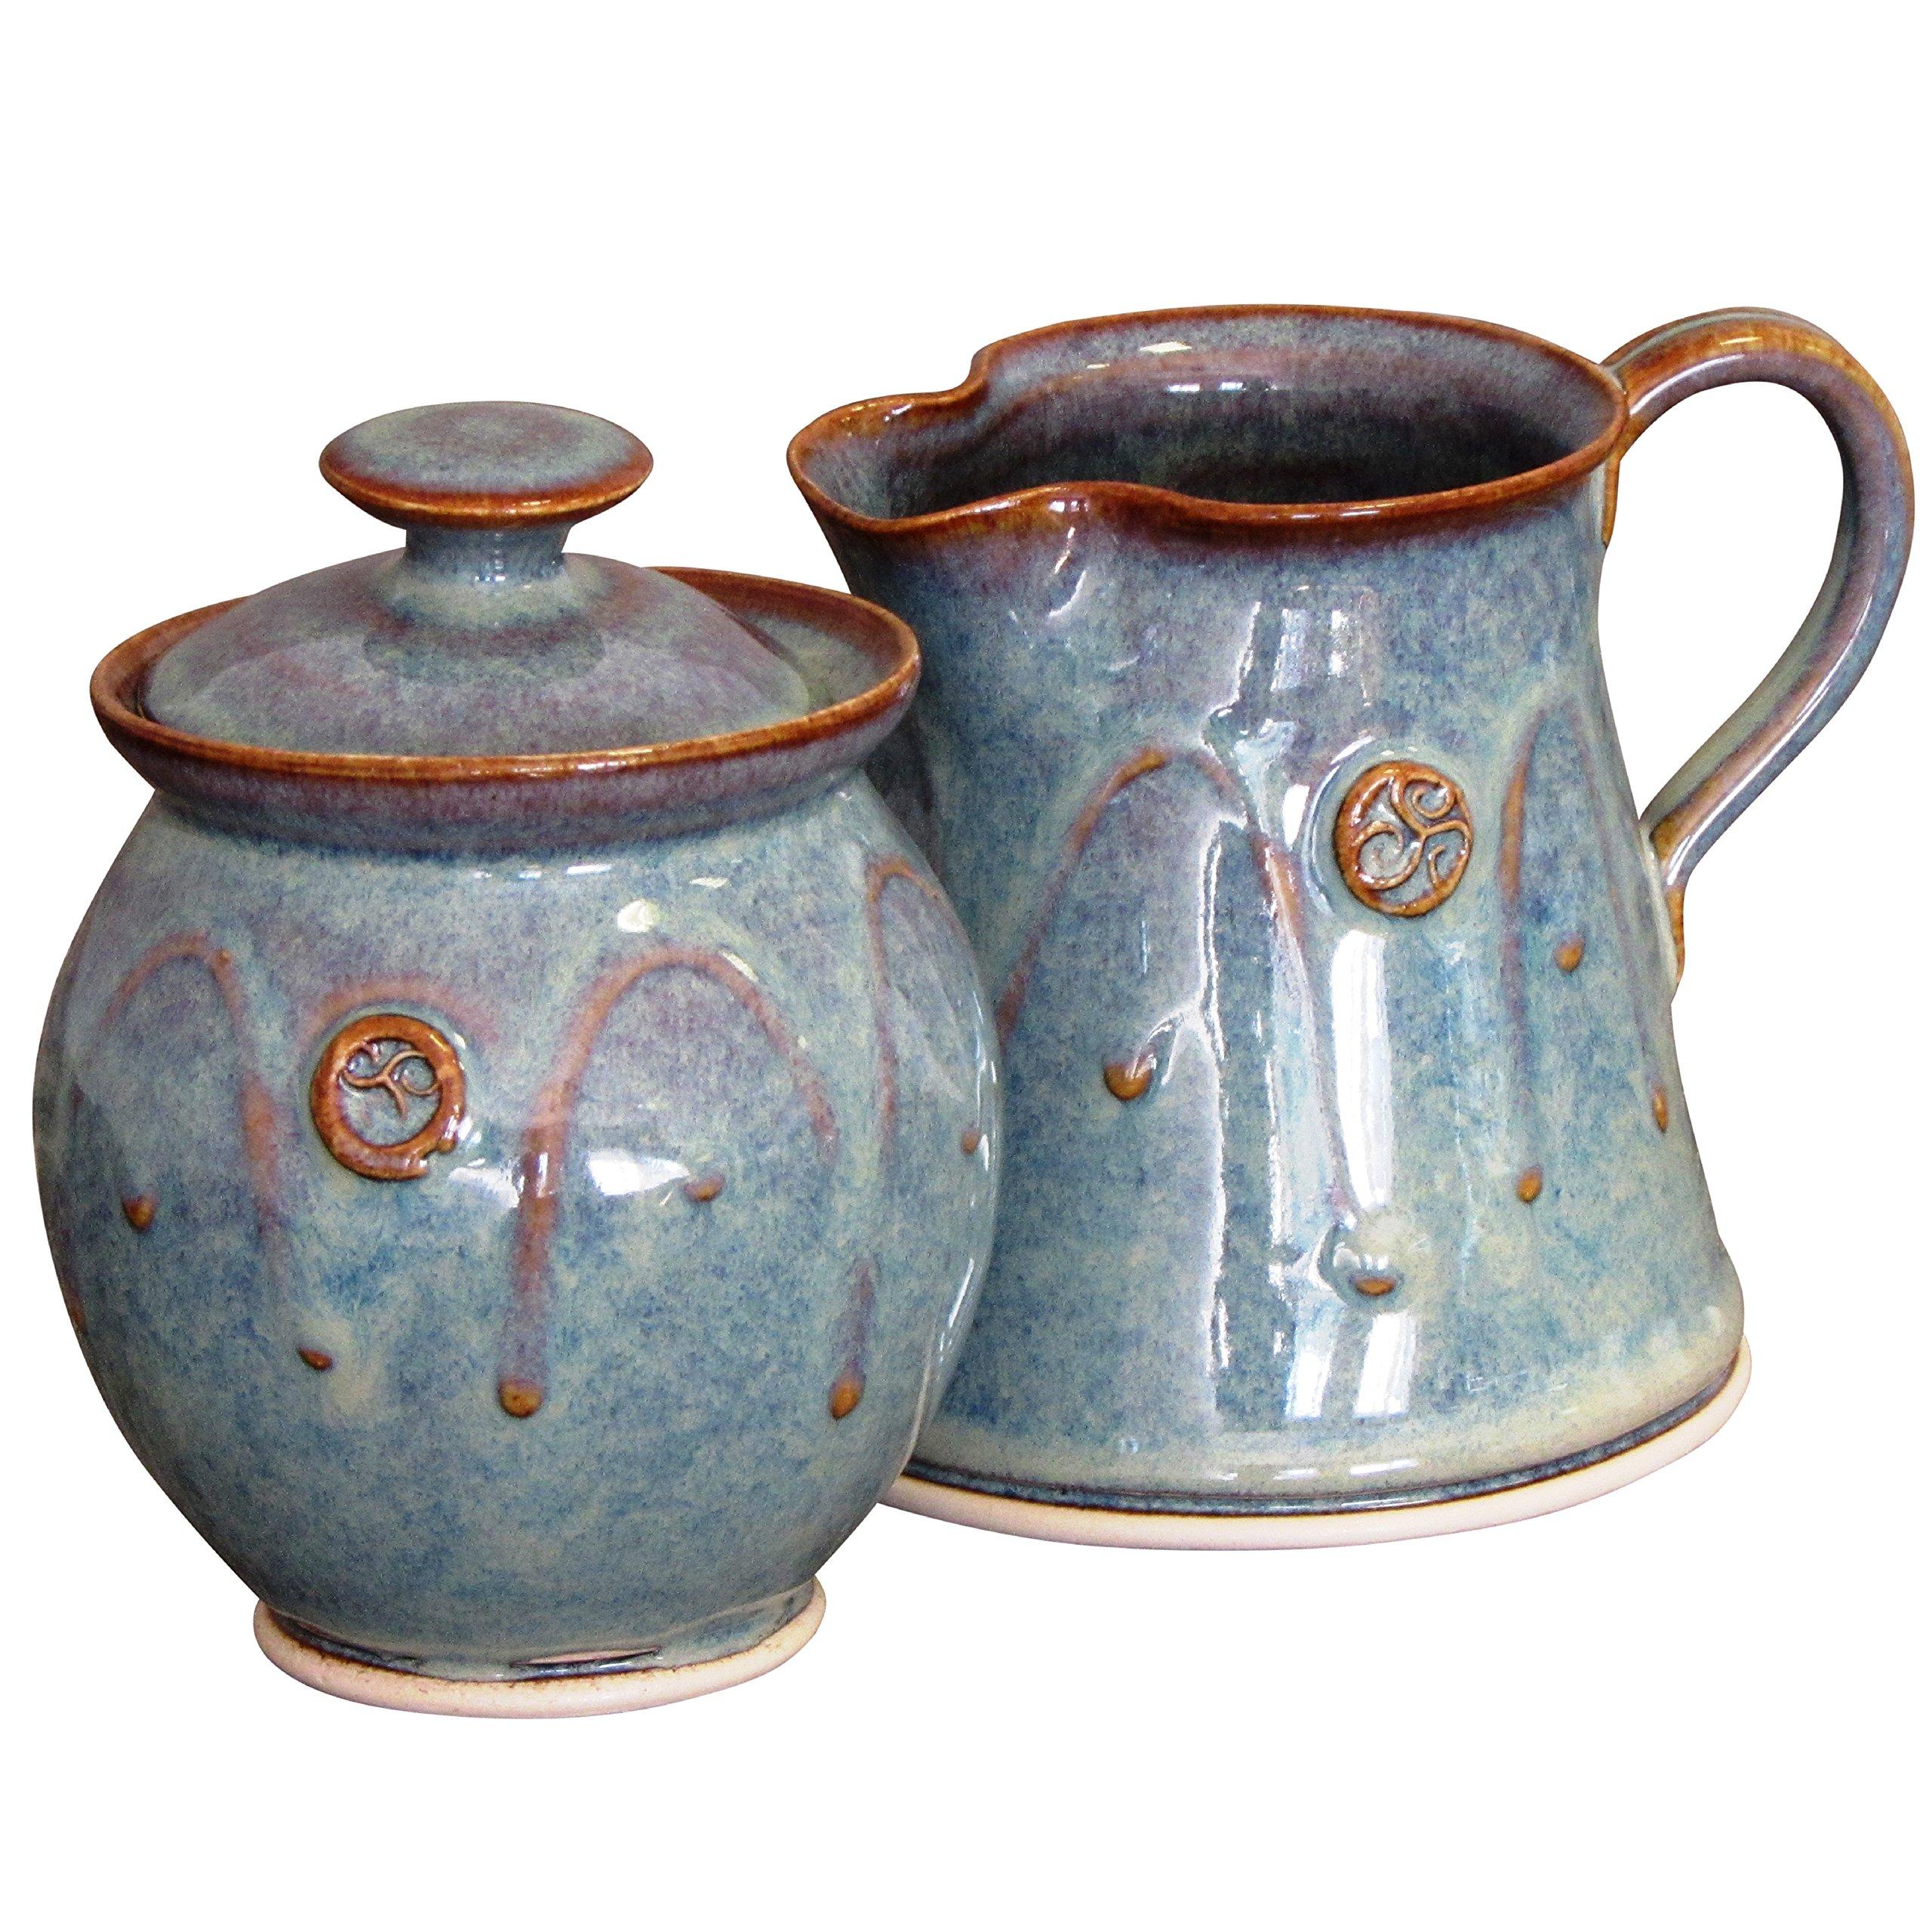 Handmade Irish Pottery Sugar and Creamer Set by Castle Arch Pottery Ireland (Image #1)